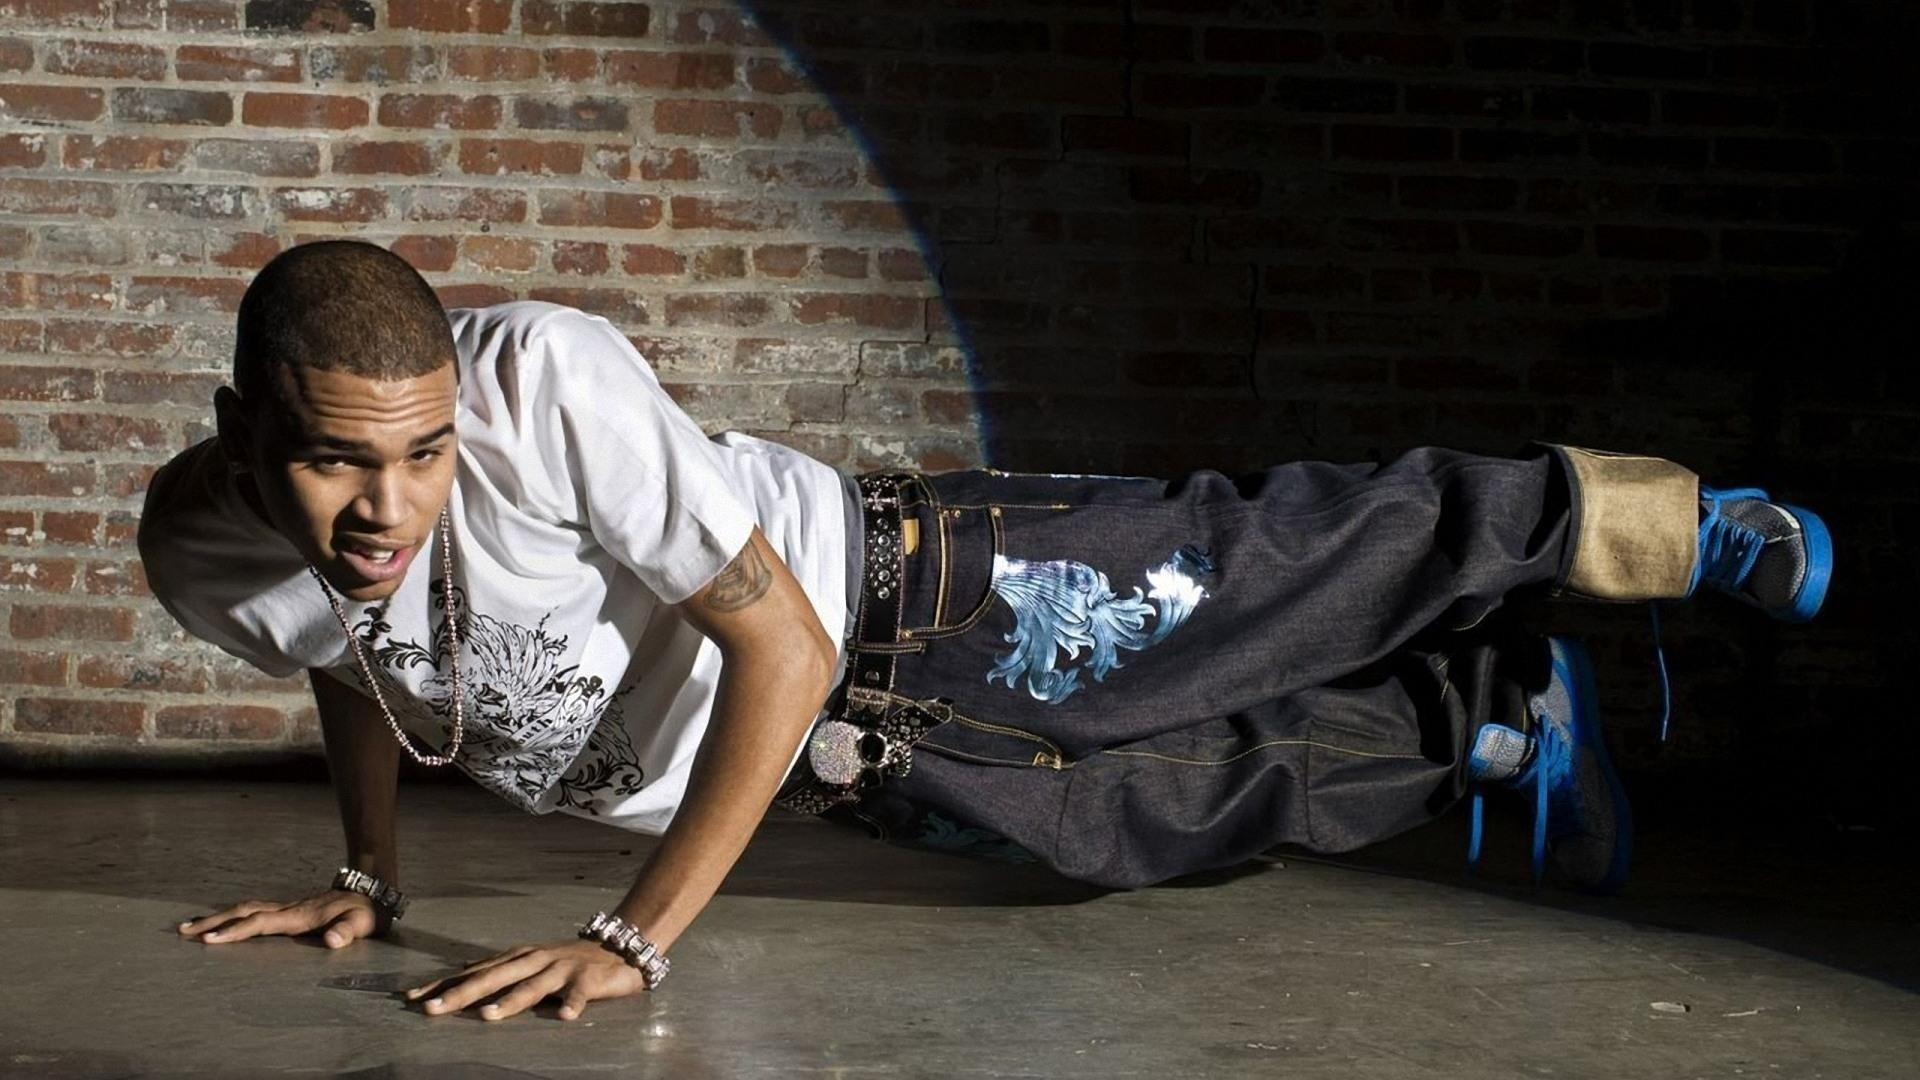 Chris Brown hd wallpaper download